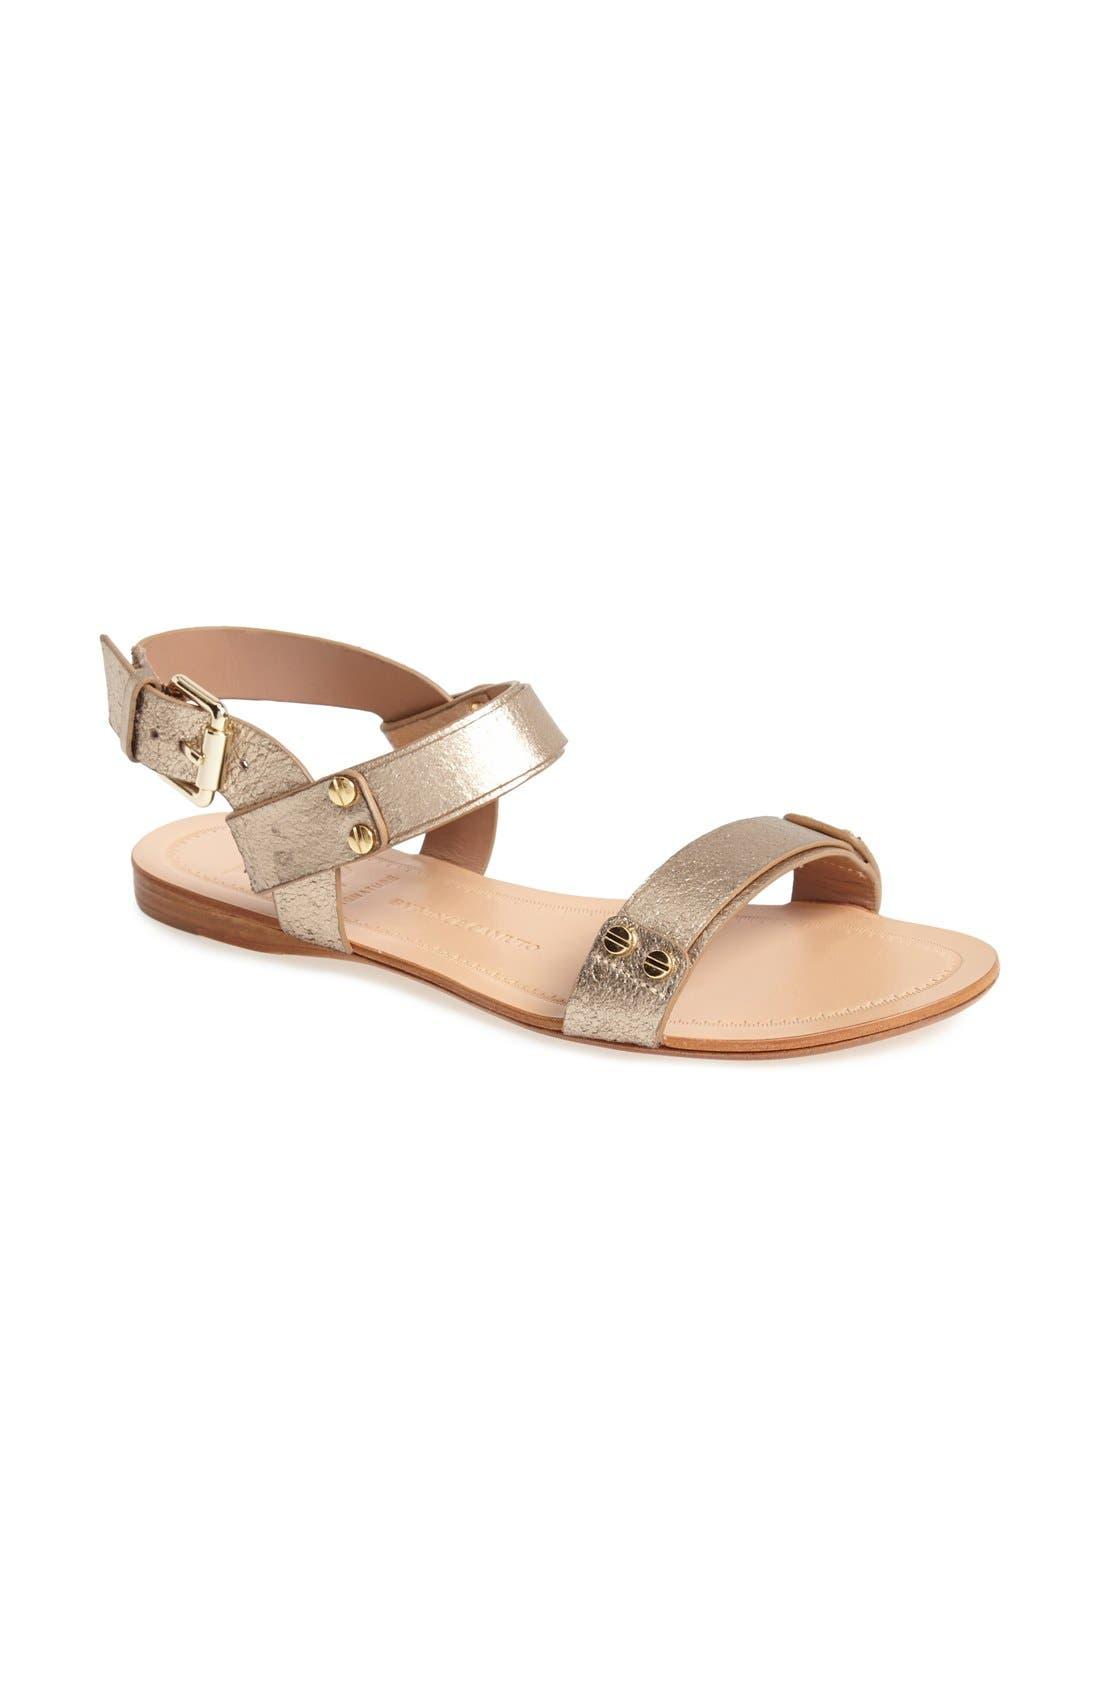 Main Image - VC Signature 'Magnoliah' Leather Sandal (Women)